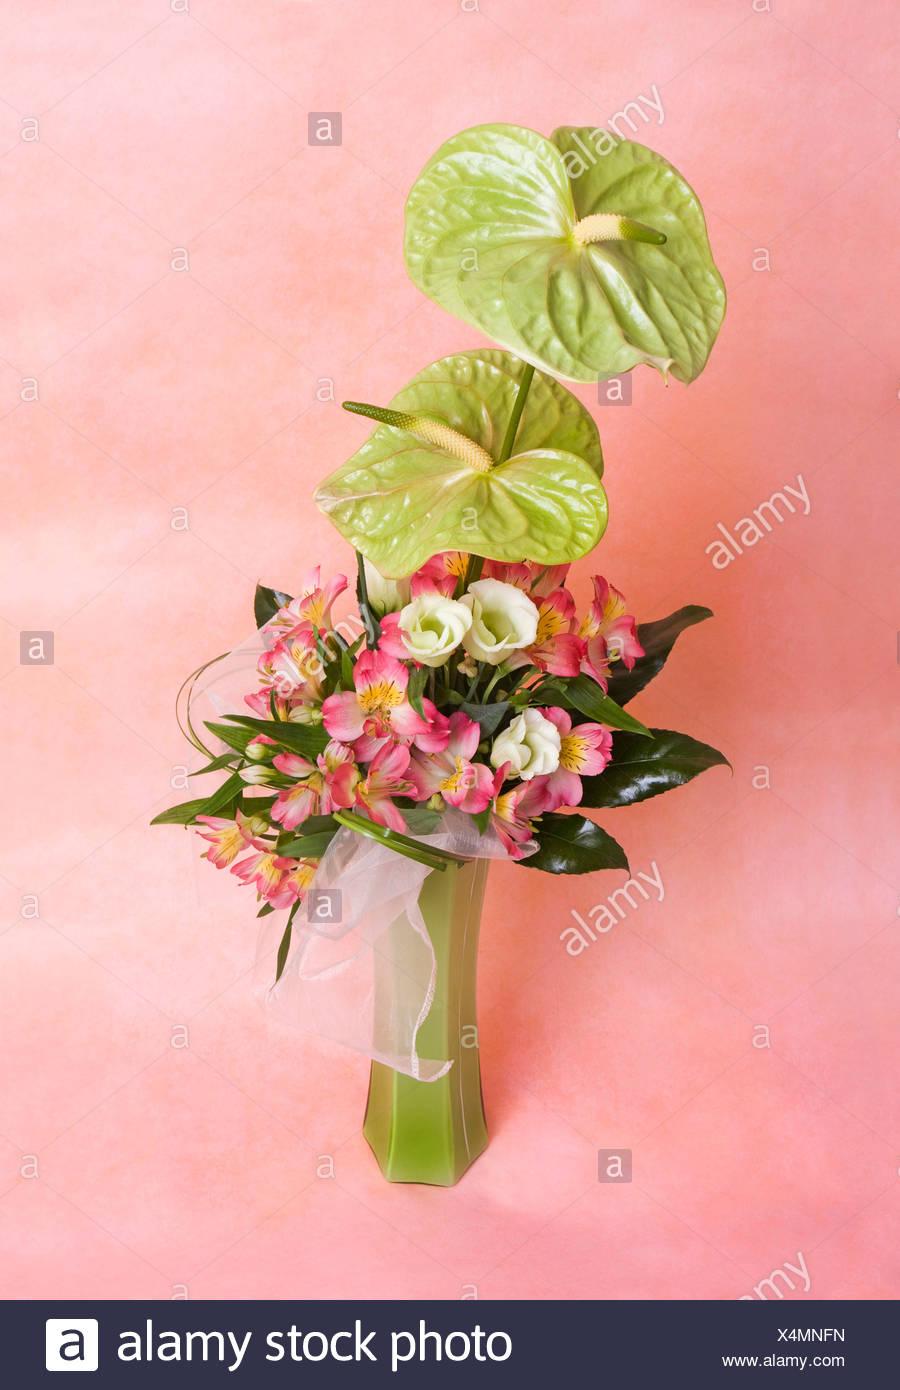 Flower Arrangement With Anthurium Flowers Stock Photo 278280457 Alamy